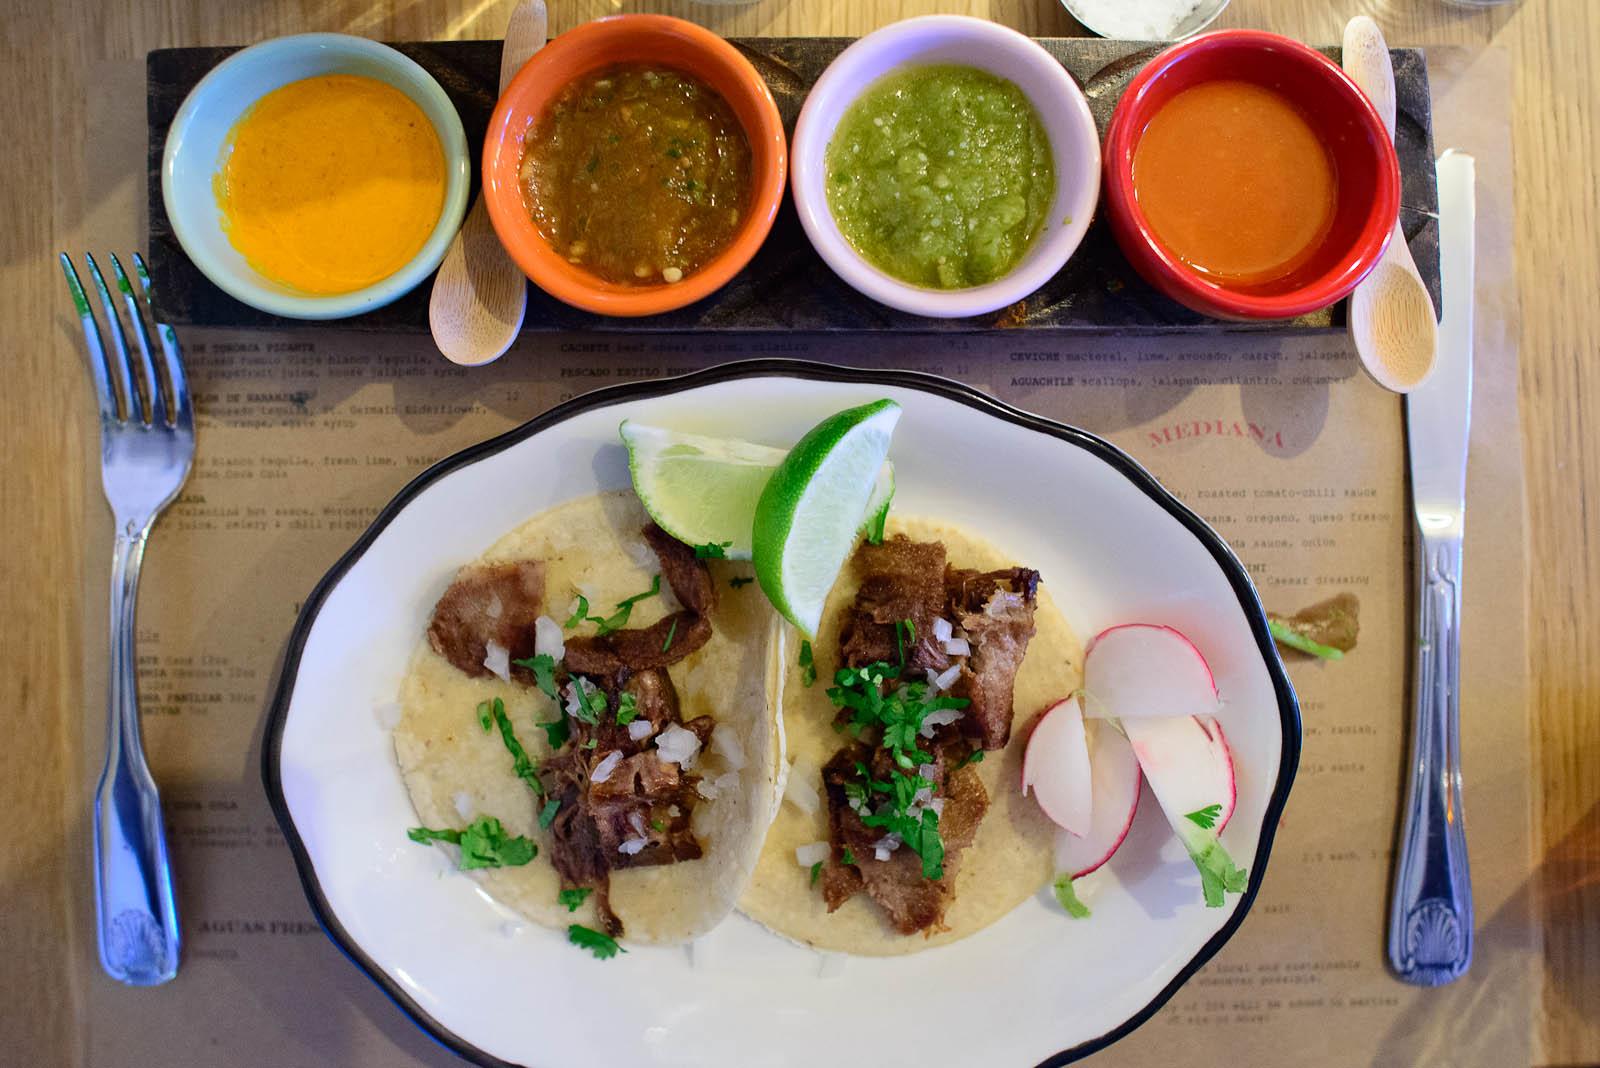 Tacos de lengua (tongue), onion, cilantro, radish with salsas (s